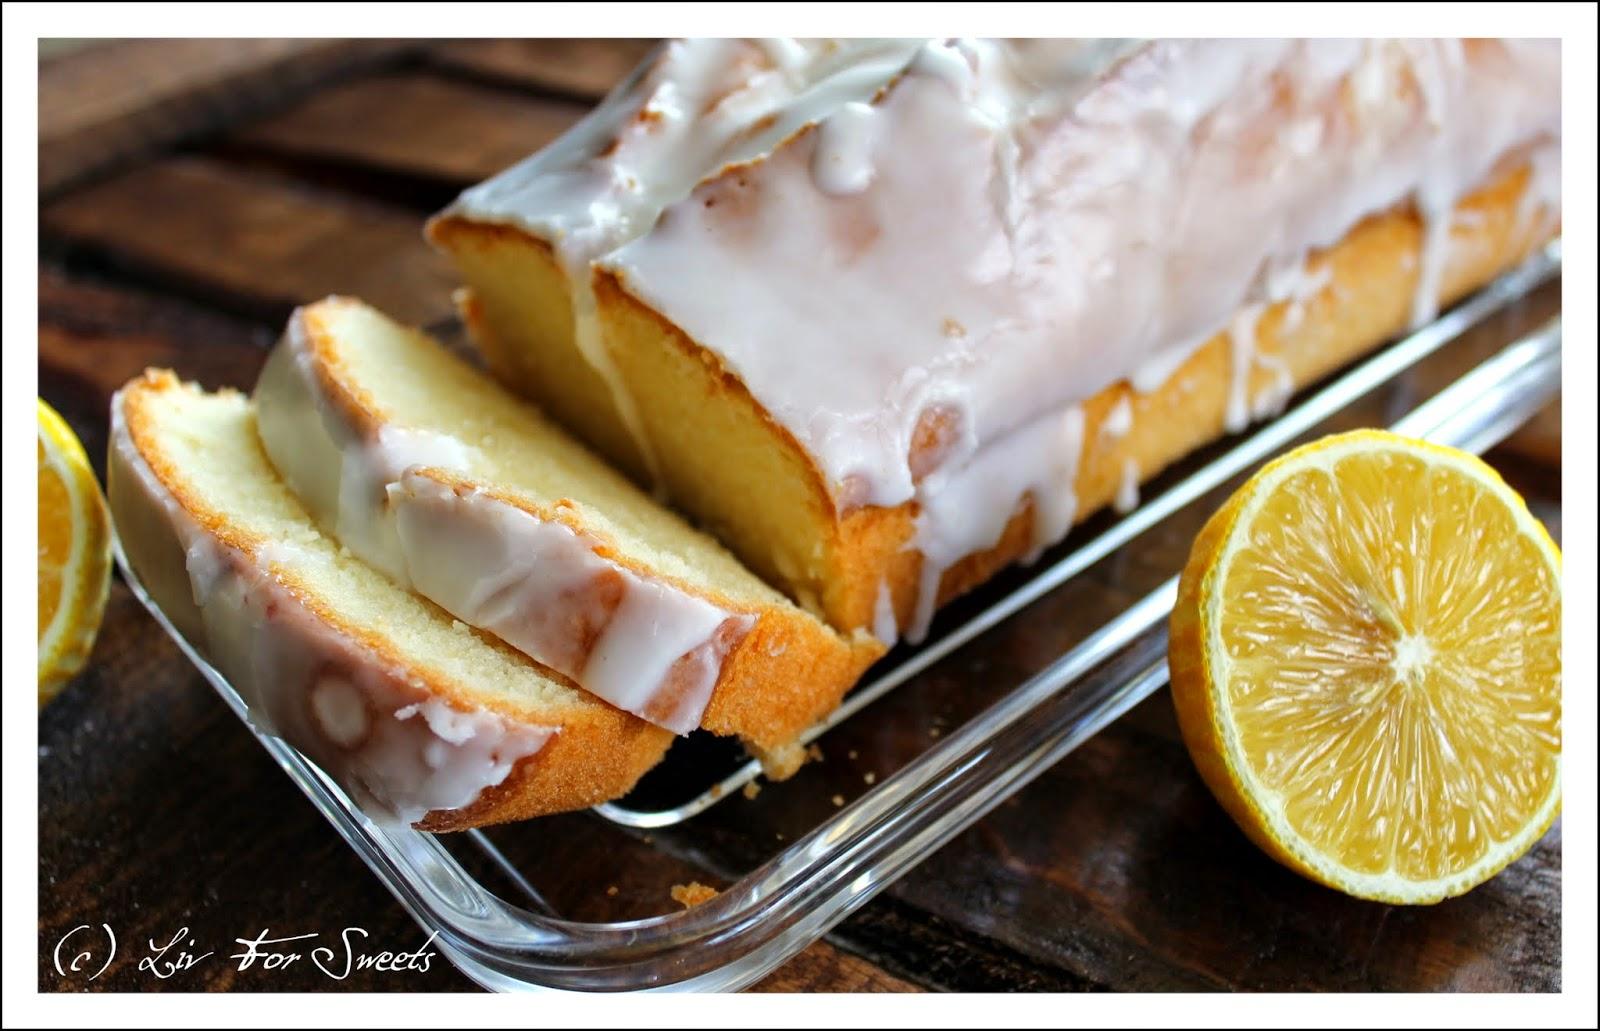 Zitronenkuchen mit Zuckerguss - Thermomix-Rezept